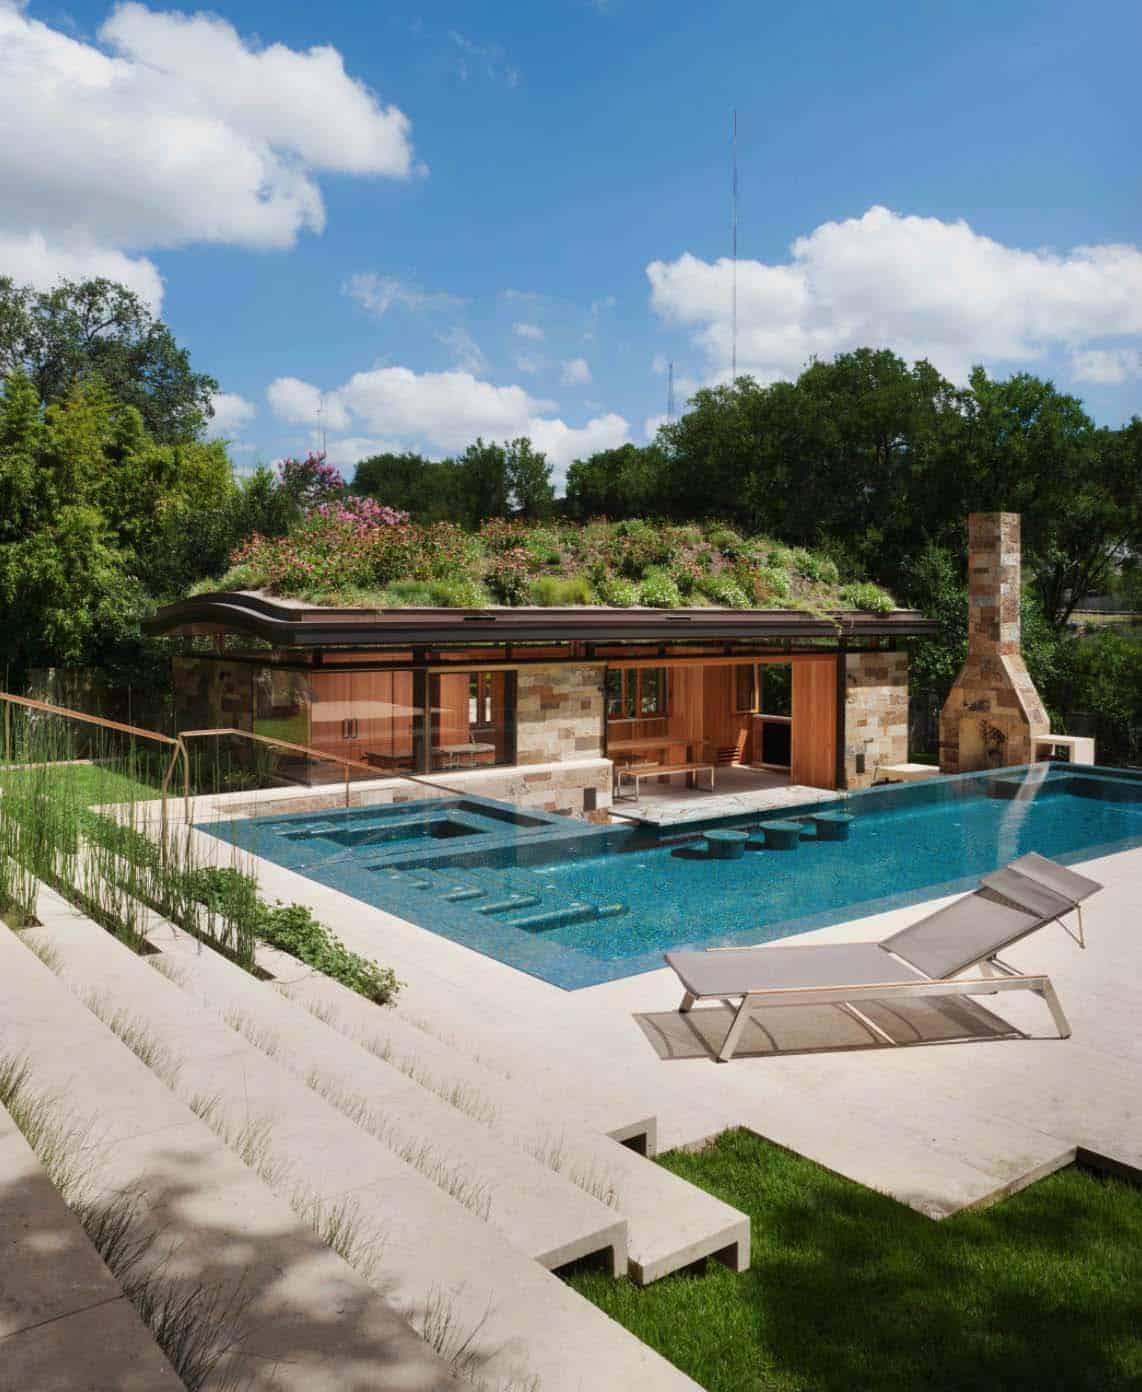 33 Mega-Impressive swim-up pool bars built for entertaining on Backyard Pool Bar Designs  id=16863